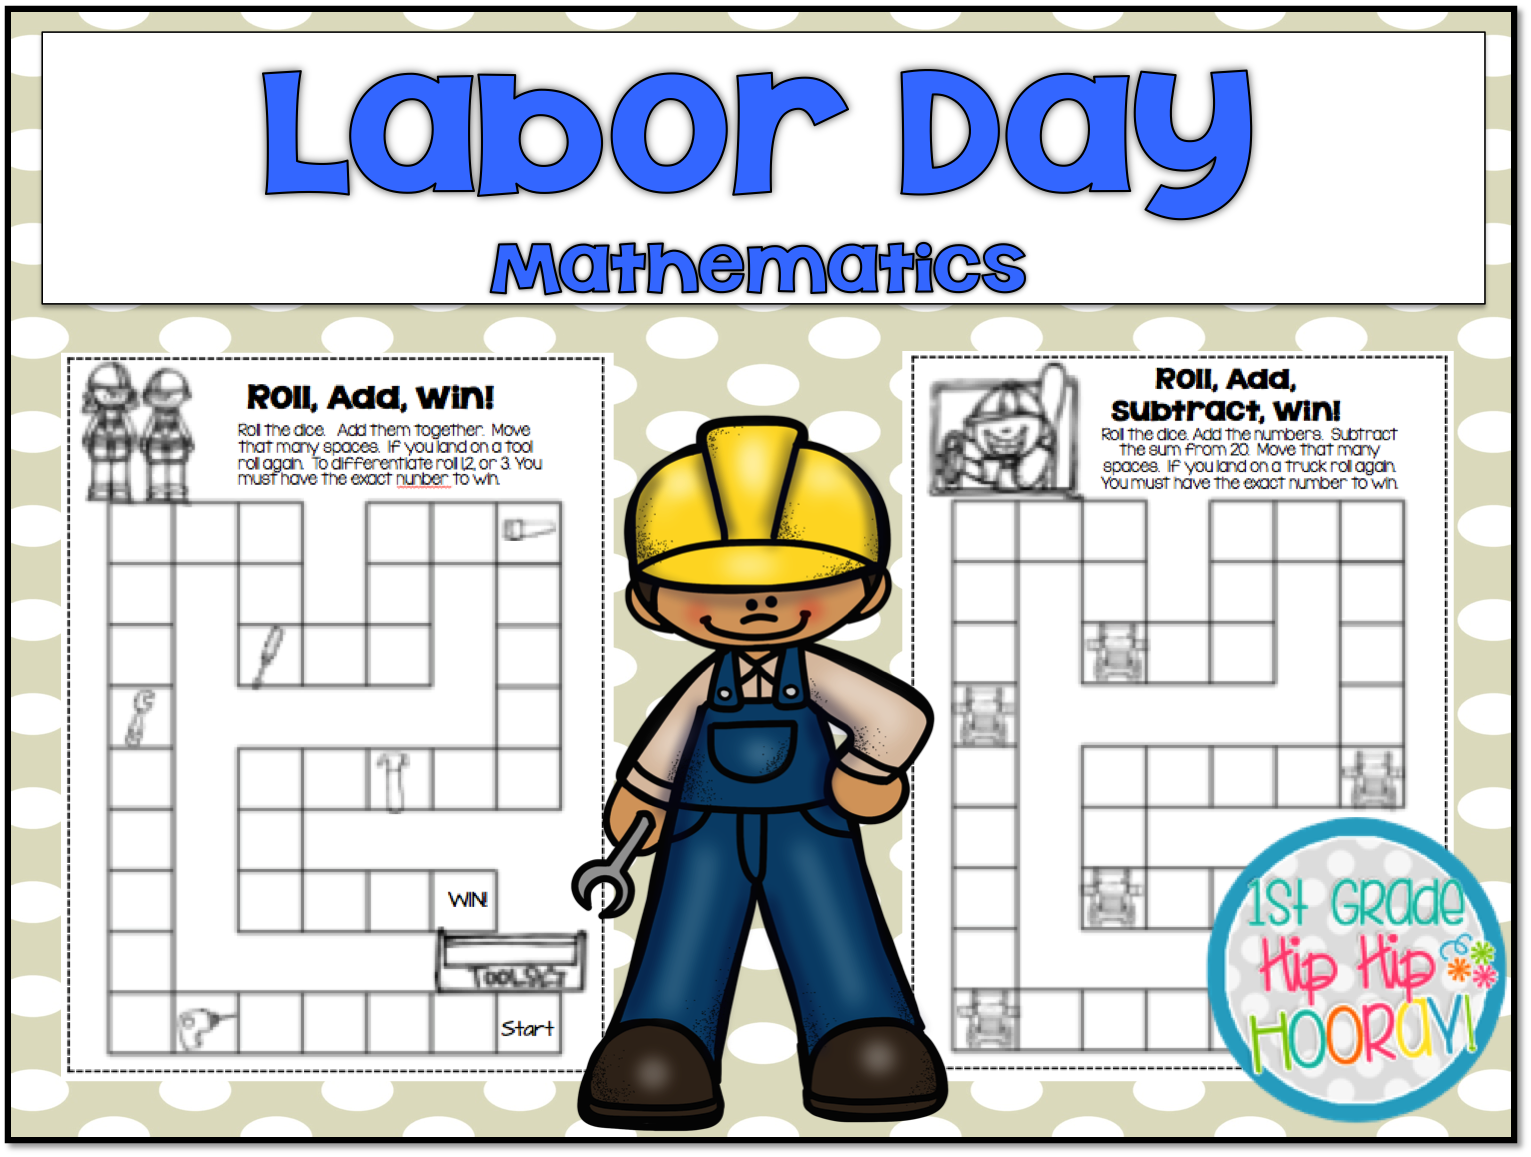 1st Grade Hip Hip Hooray!: Labor Day! #morethanathreedayweekend [ 1157 x 1531 Pixel ]